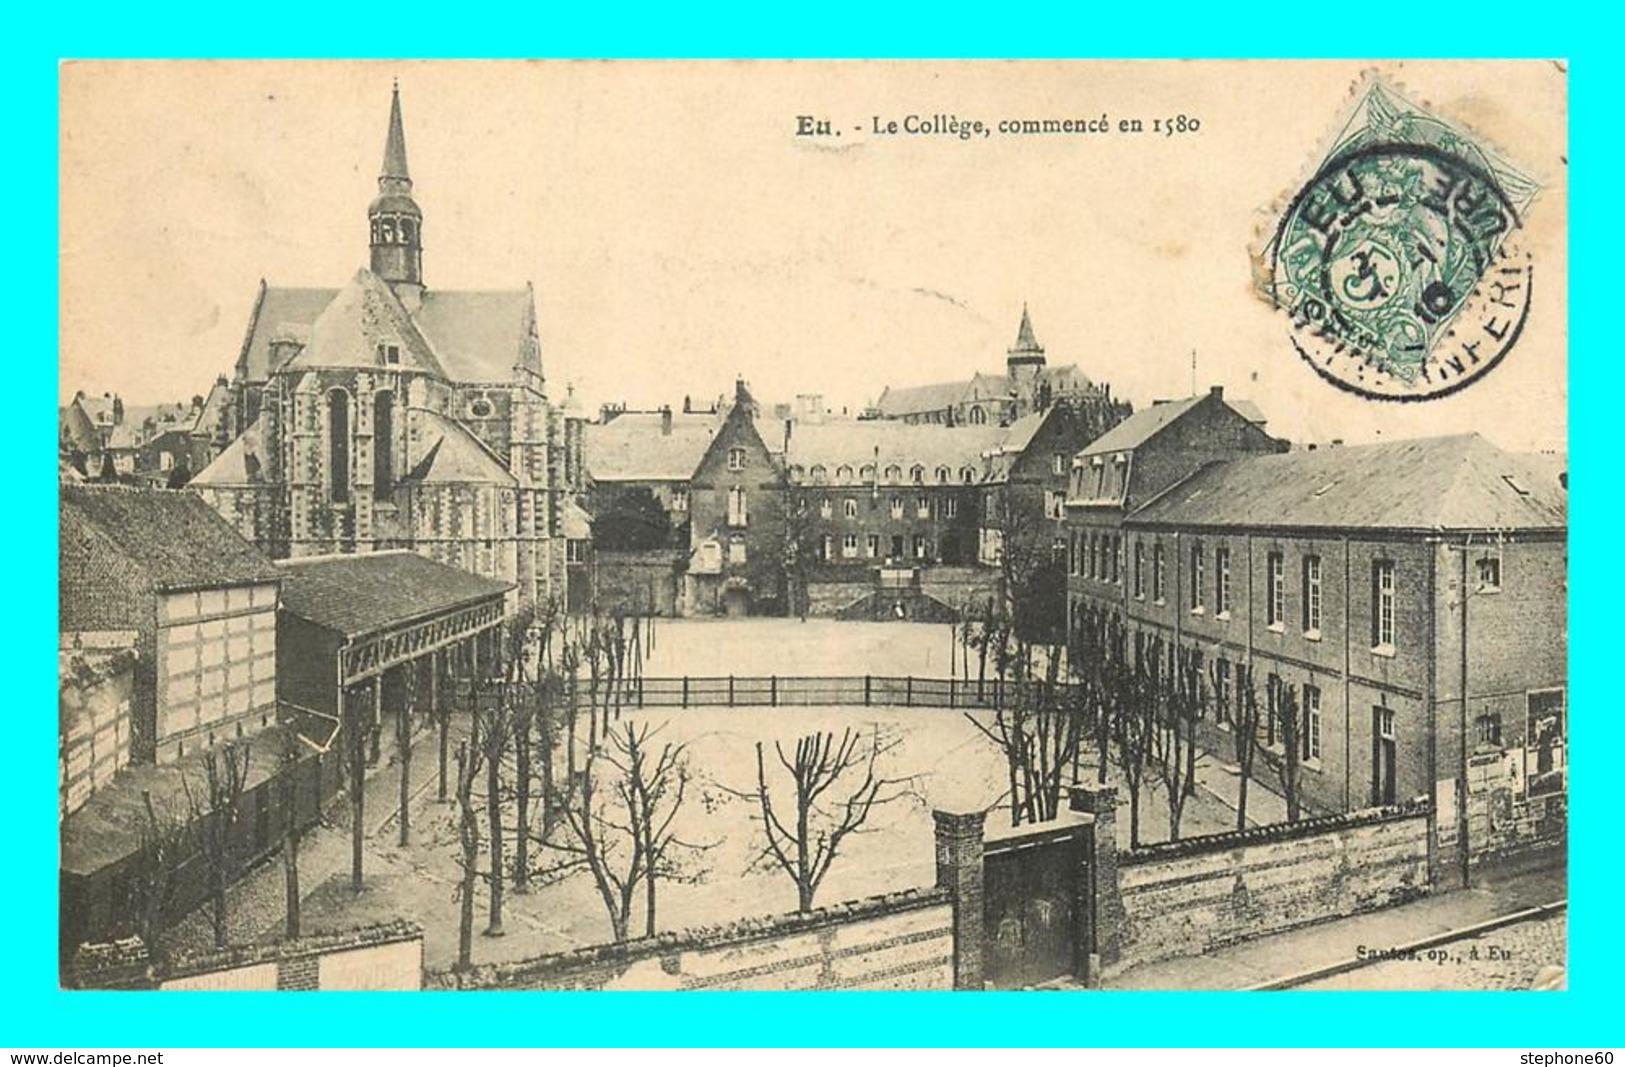 A766 / 041 76 - EU College Commencé En 1580 - Eu